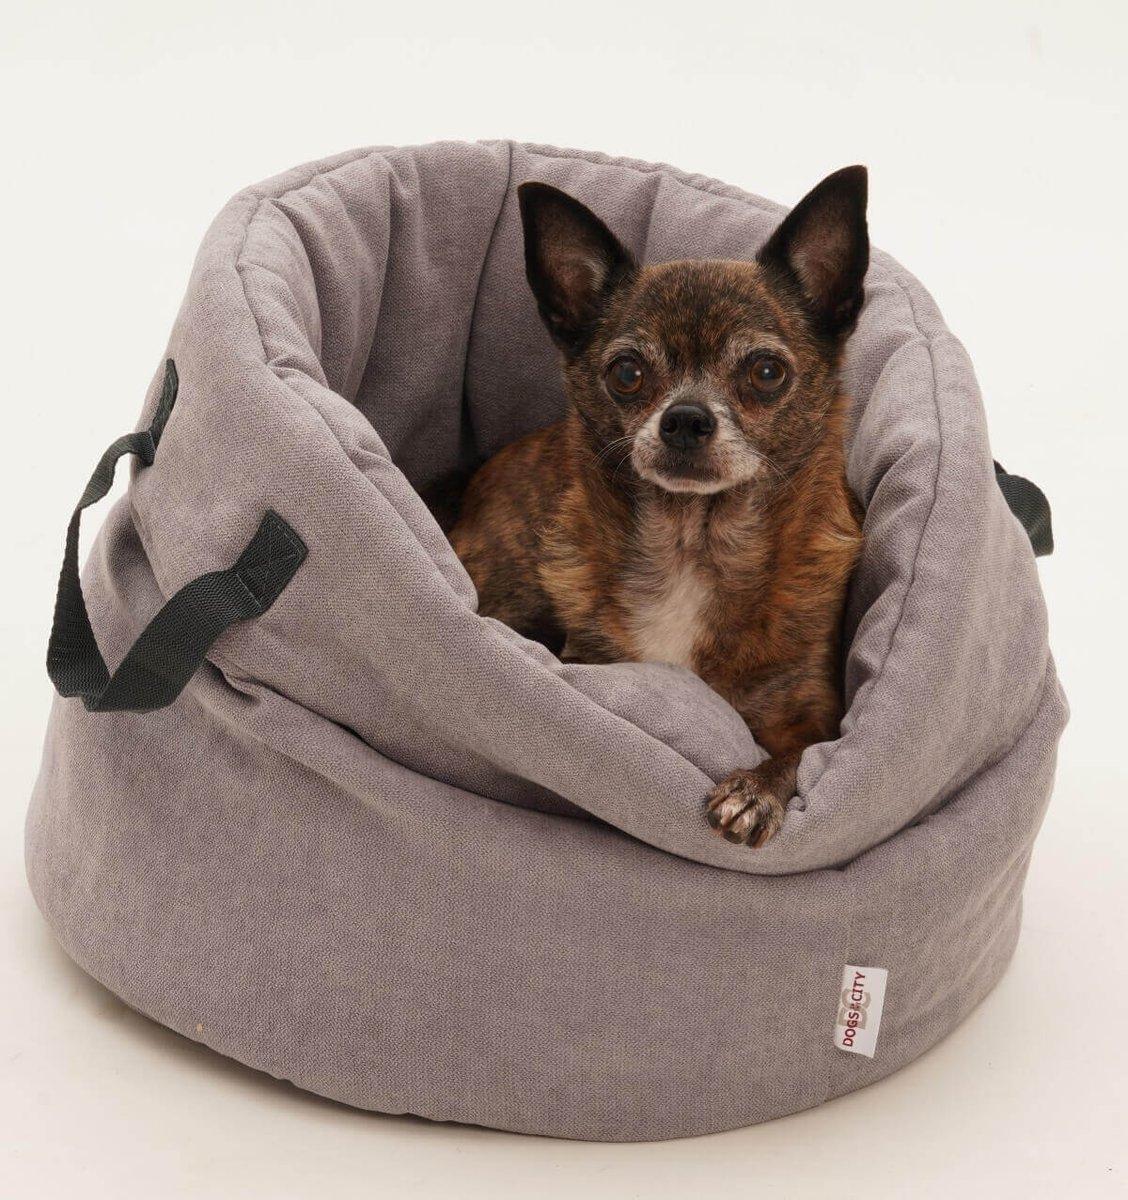 MY LITTLE BASKET ...NEW IN!   #Bolonka #chihuahua #Dackel #DOGSintheCITY #dogsinthecity #germany #grau #Handarbeit #handmade #Hundehöhle #Hundekörbchen #Hundetasche #interieur #interior #kleineHunde #Kuschelhöhle #Luxus #Shopper #Teckelliebe #waschbar #W http://bit.ly/2OuoSlYpic.twitter.com/1hxRSkJHQ5